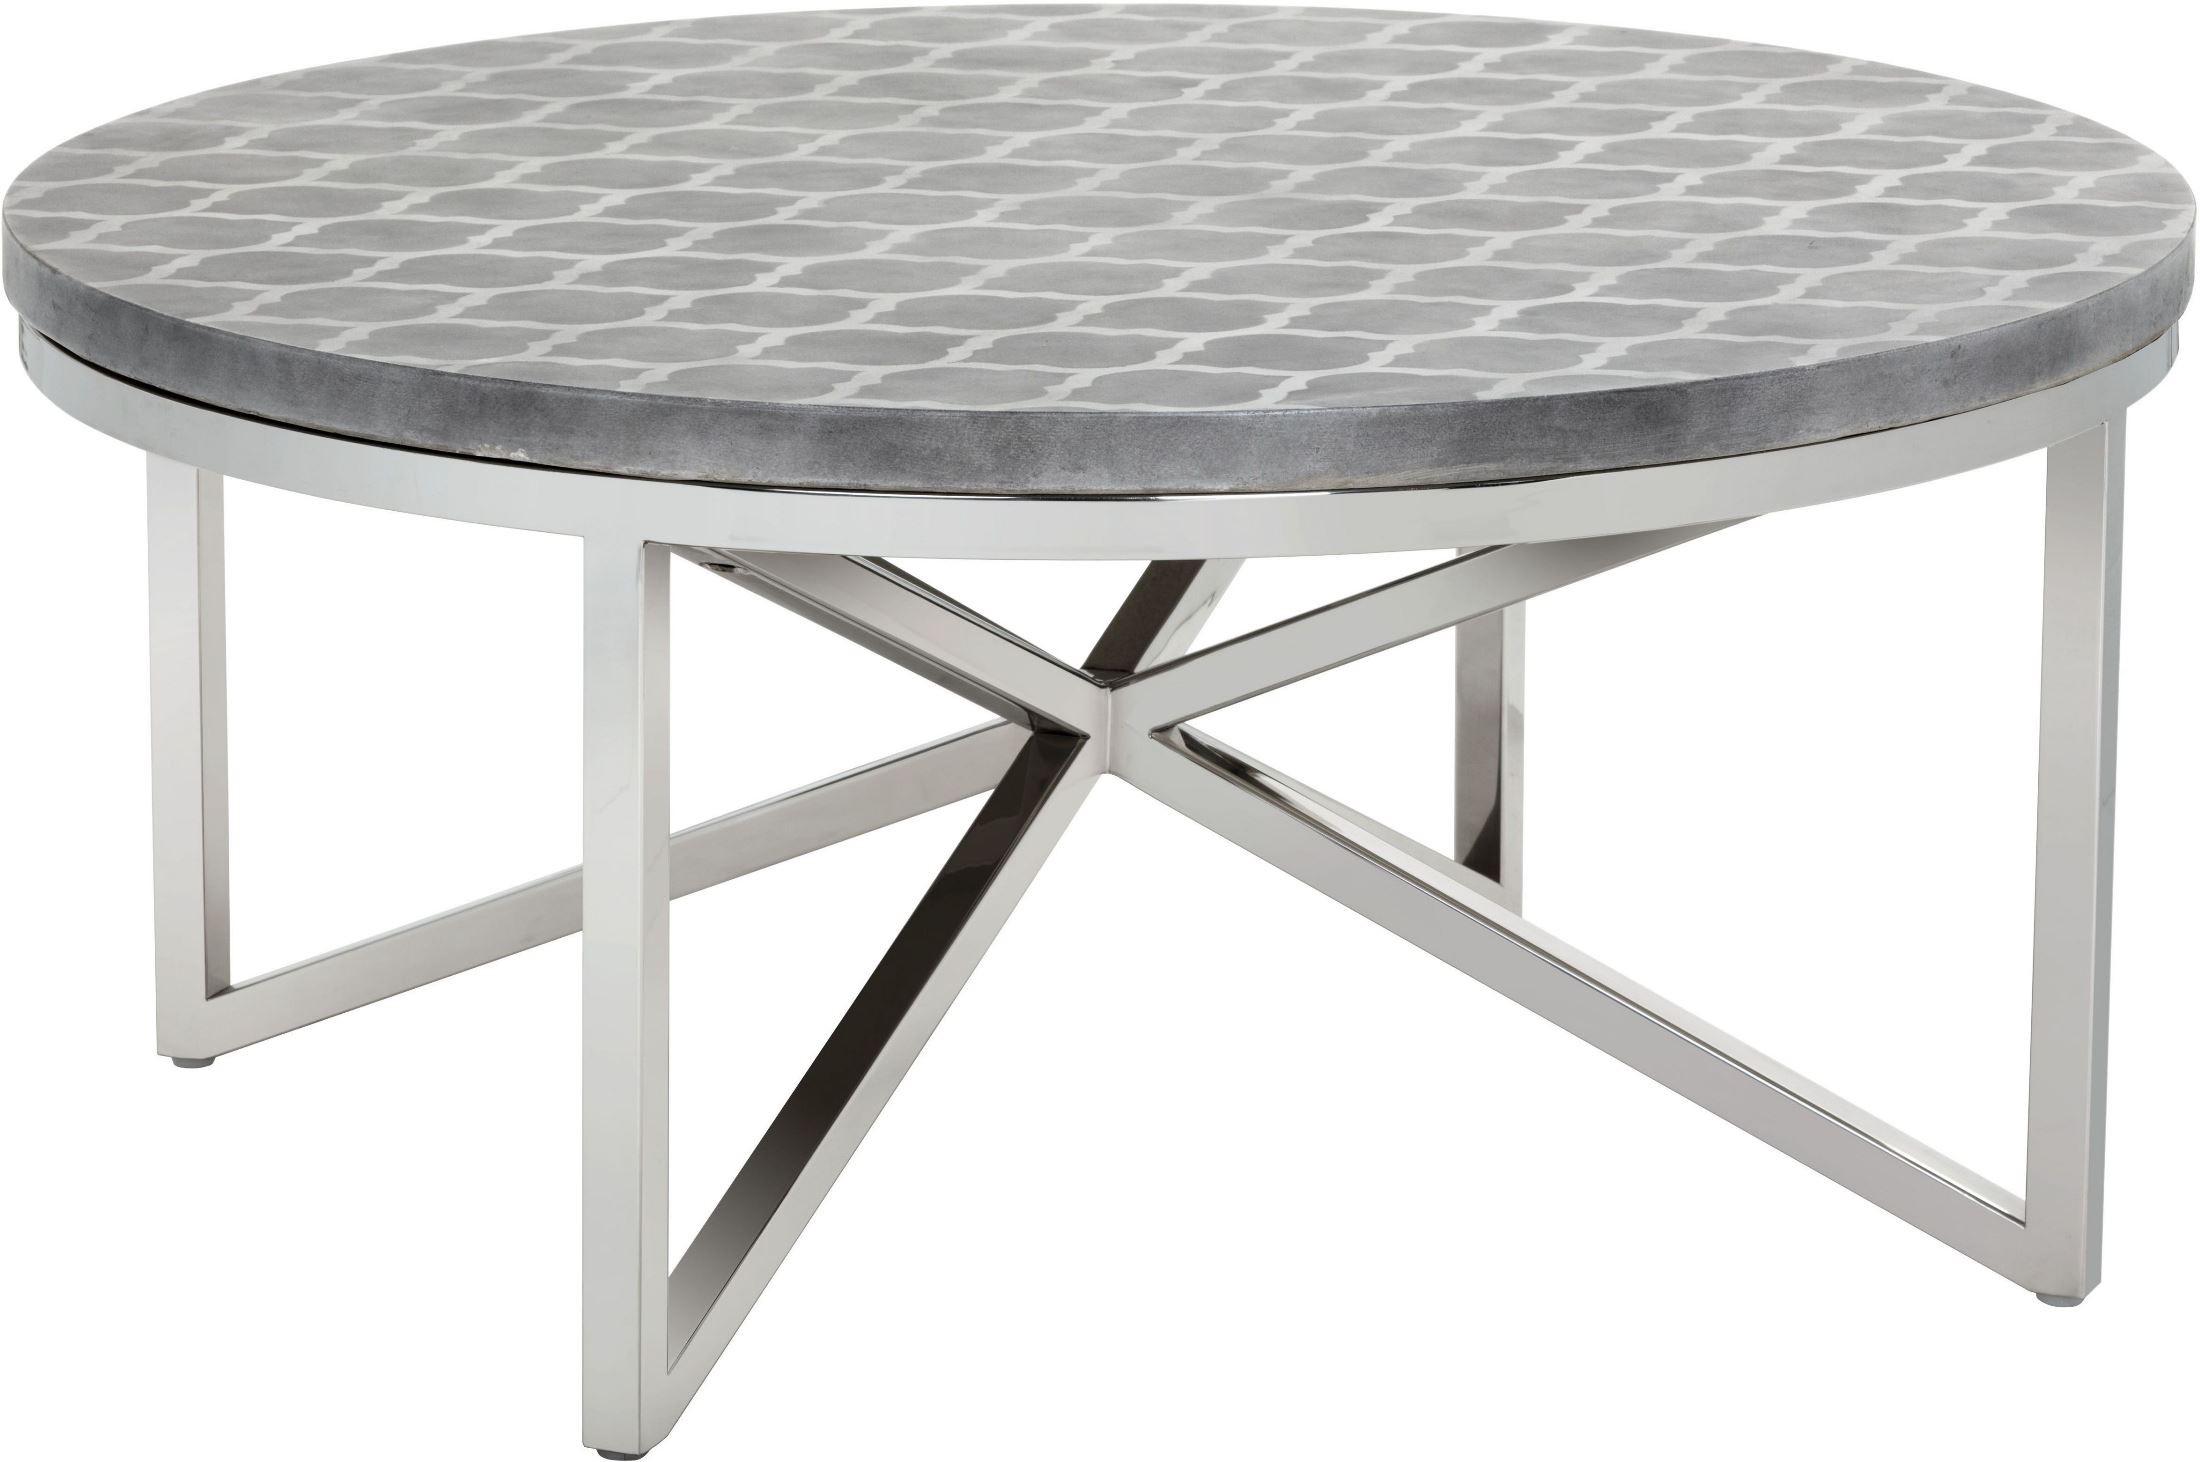 Dion stencil geometric coffee table 101431 sunpan modern for Geometric coffee table